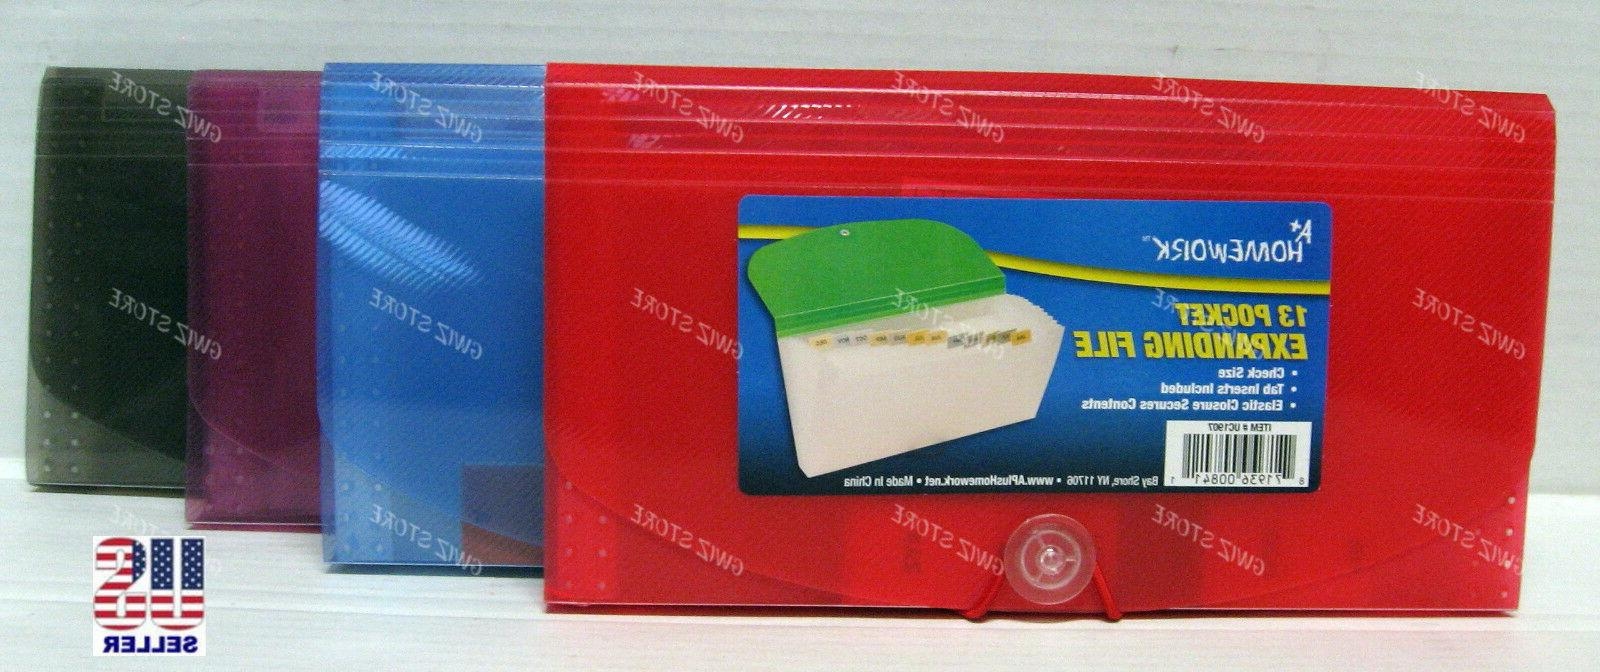 coupon organizer holder expanding file 13 pocket